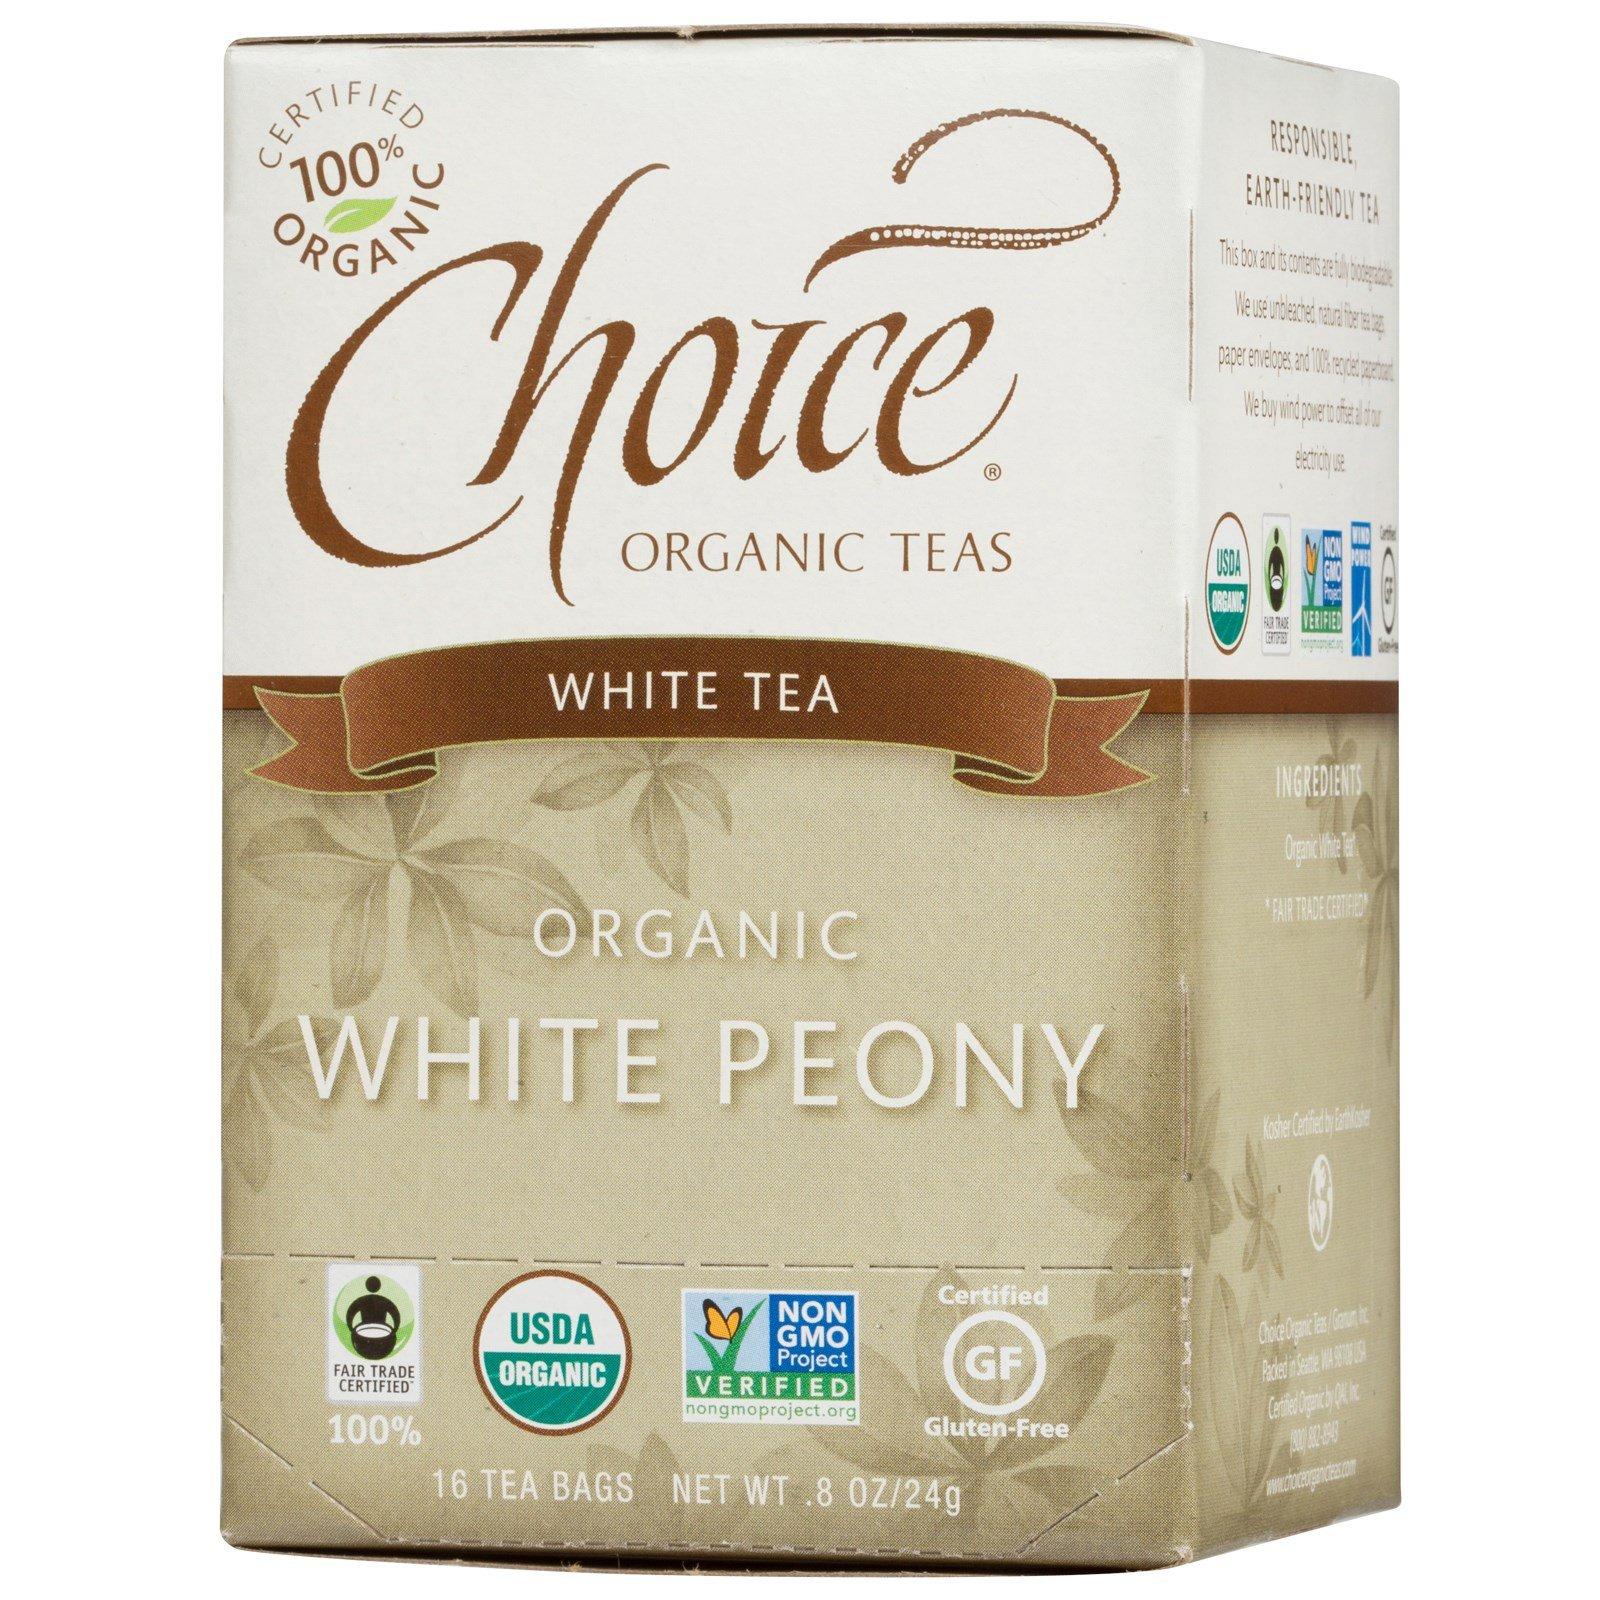 Choice Organic Teas, Organic, White Peony, White Tea, 16 Tea Bags, .8 oz (24 g) Choice Organic Teas, Organic, White Peony, White Tea, 16 Tea Bags, .8 oz (24 g) - 2pcs